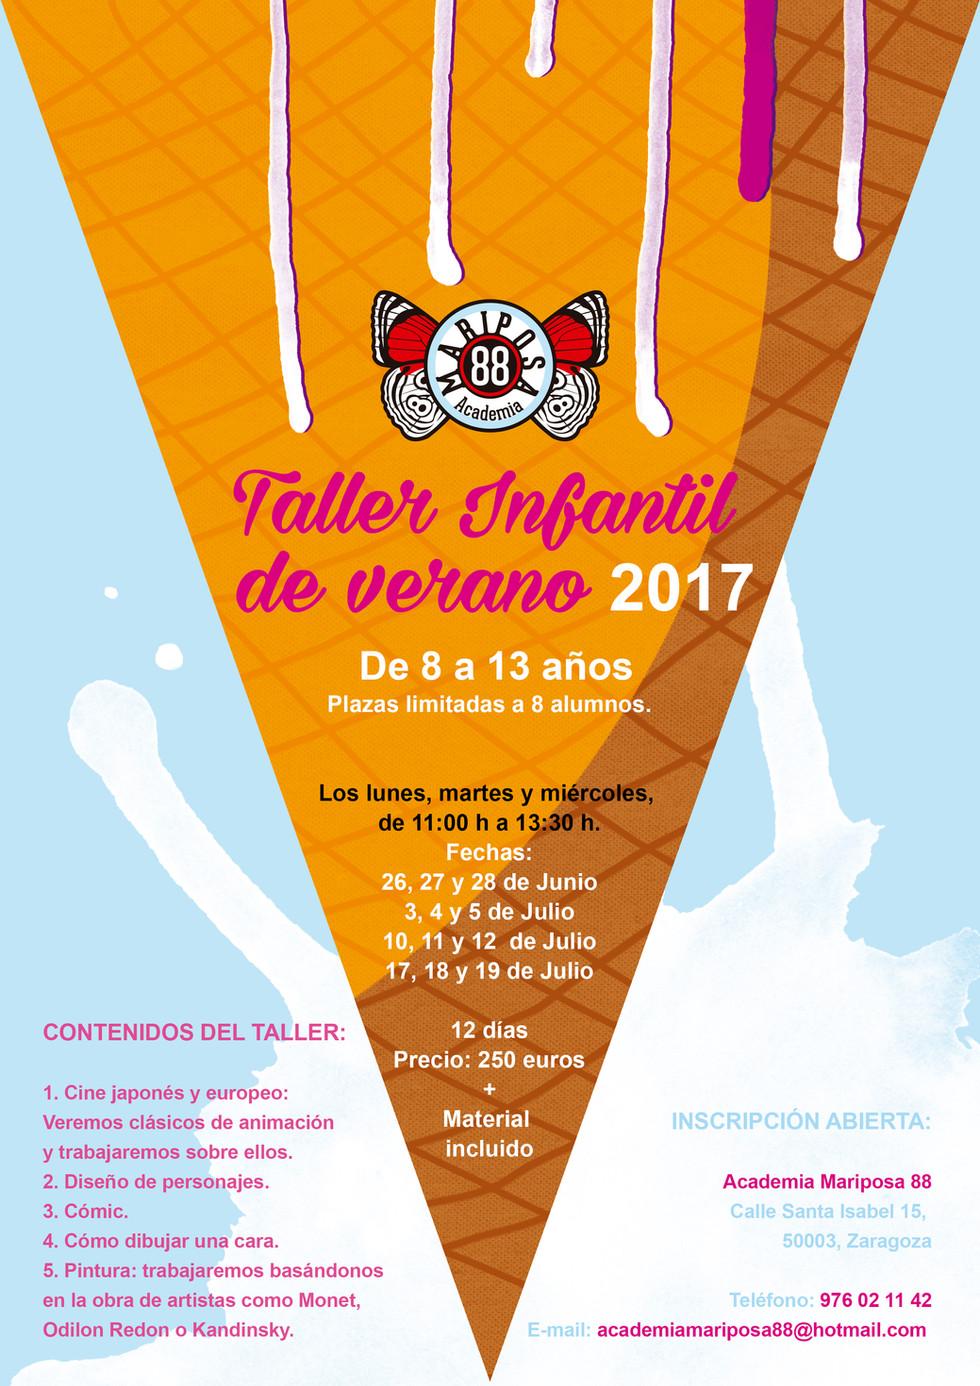 TALLER INFANTIL DE VERANO 2017